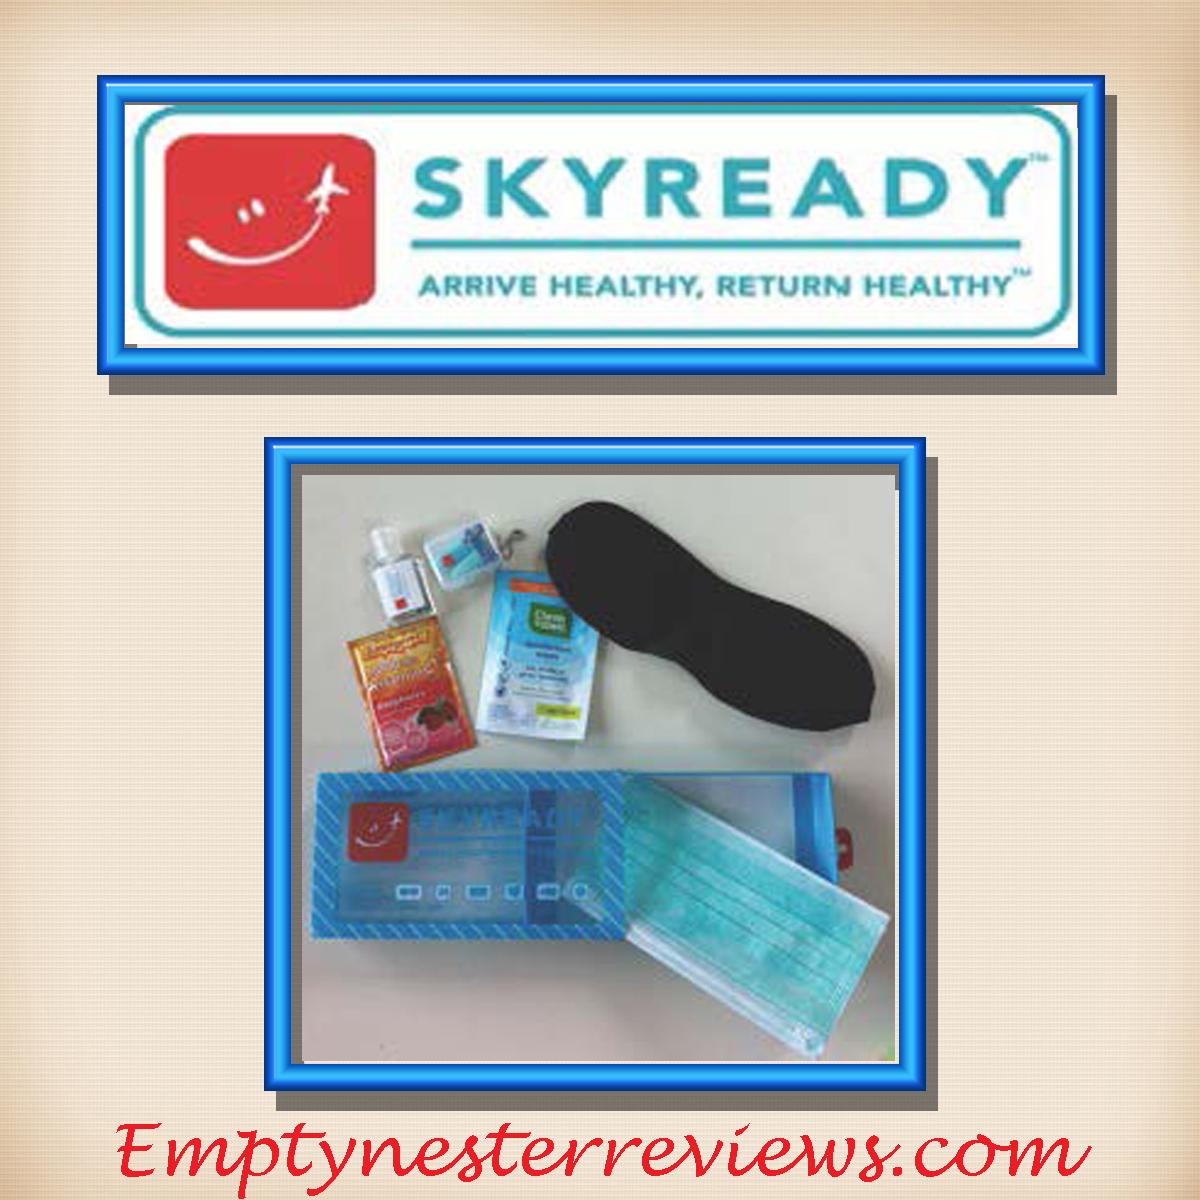 Skyready kit review Great Holiday Gift Idea